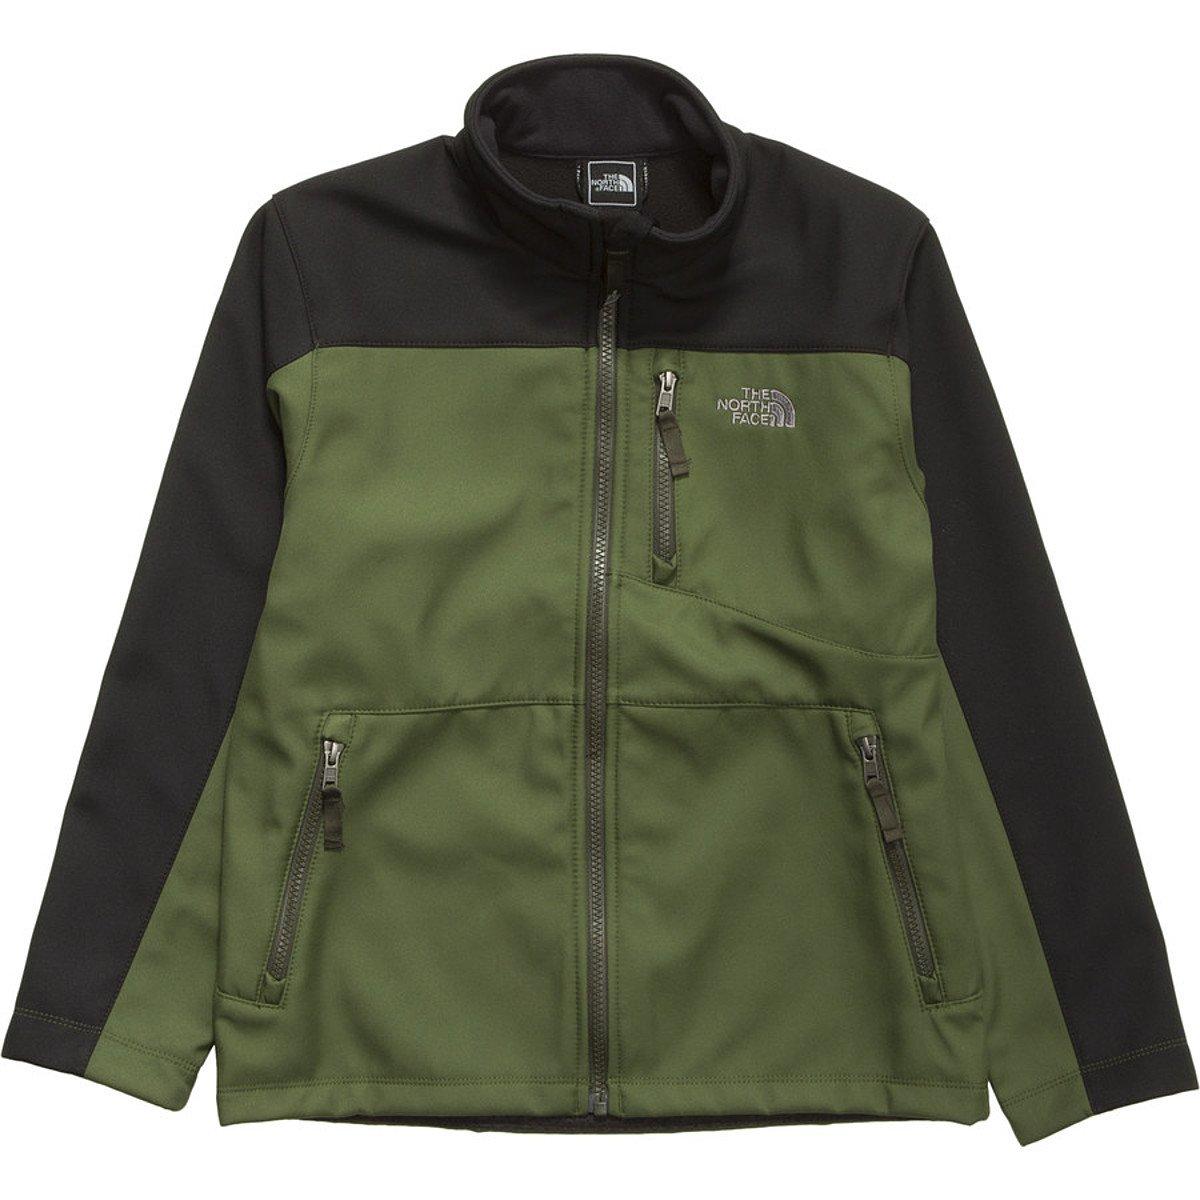 61f702610fa9 Amazon.com   The North Face B TNF Apex Bionic Jacket Scallion Green Boys XL    Sports   Outdoors